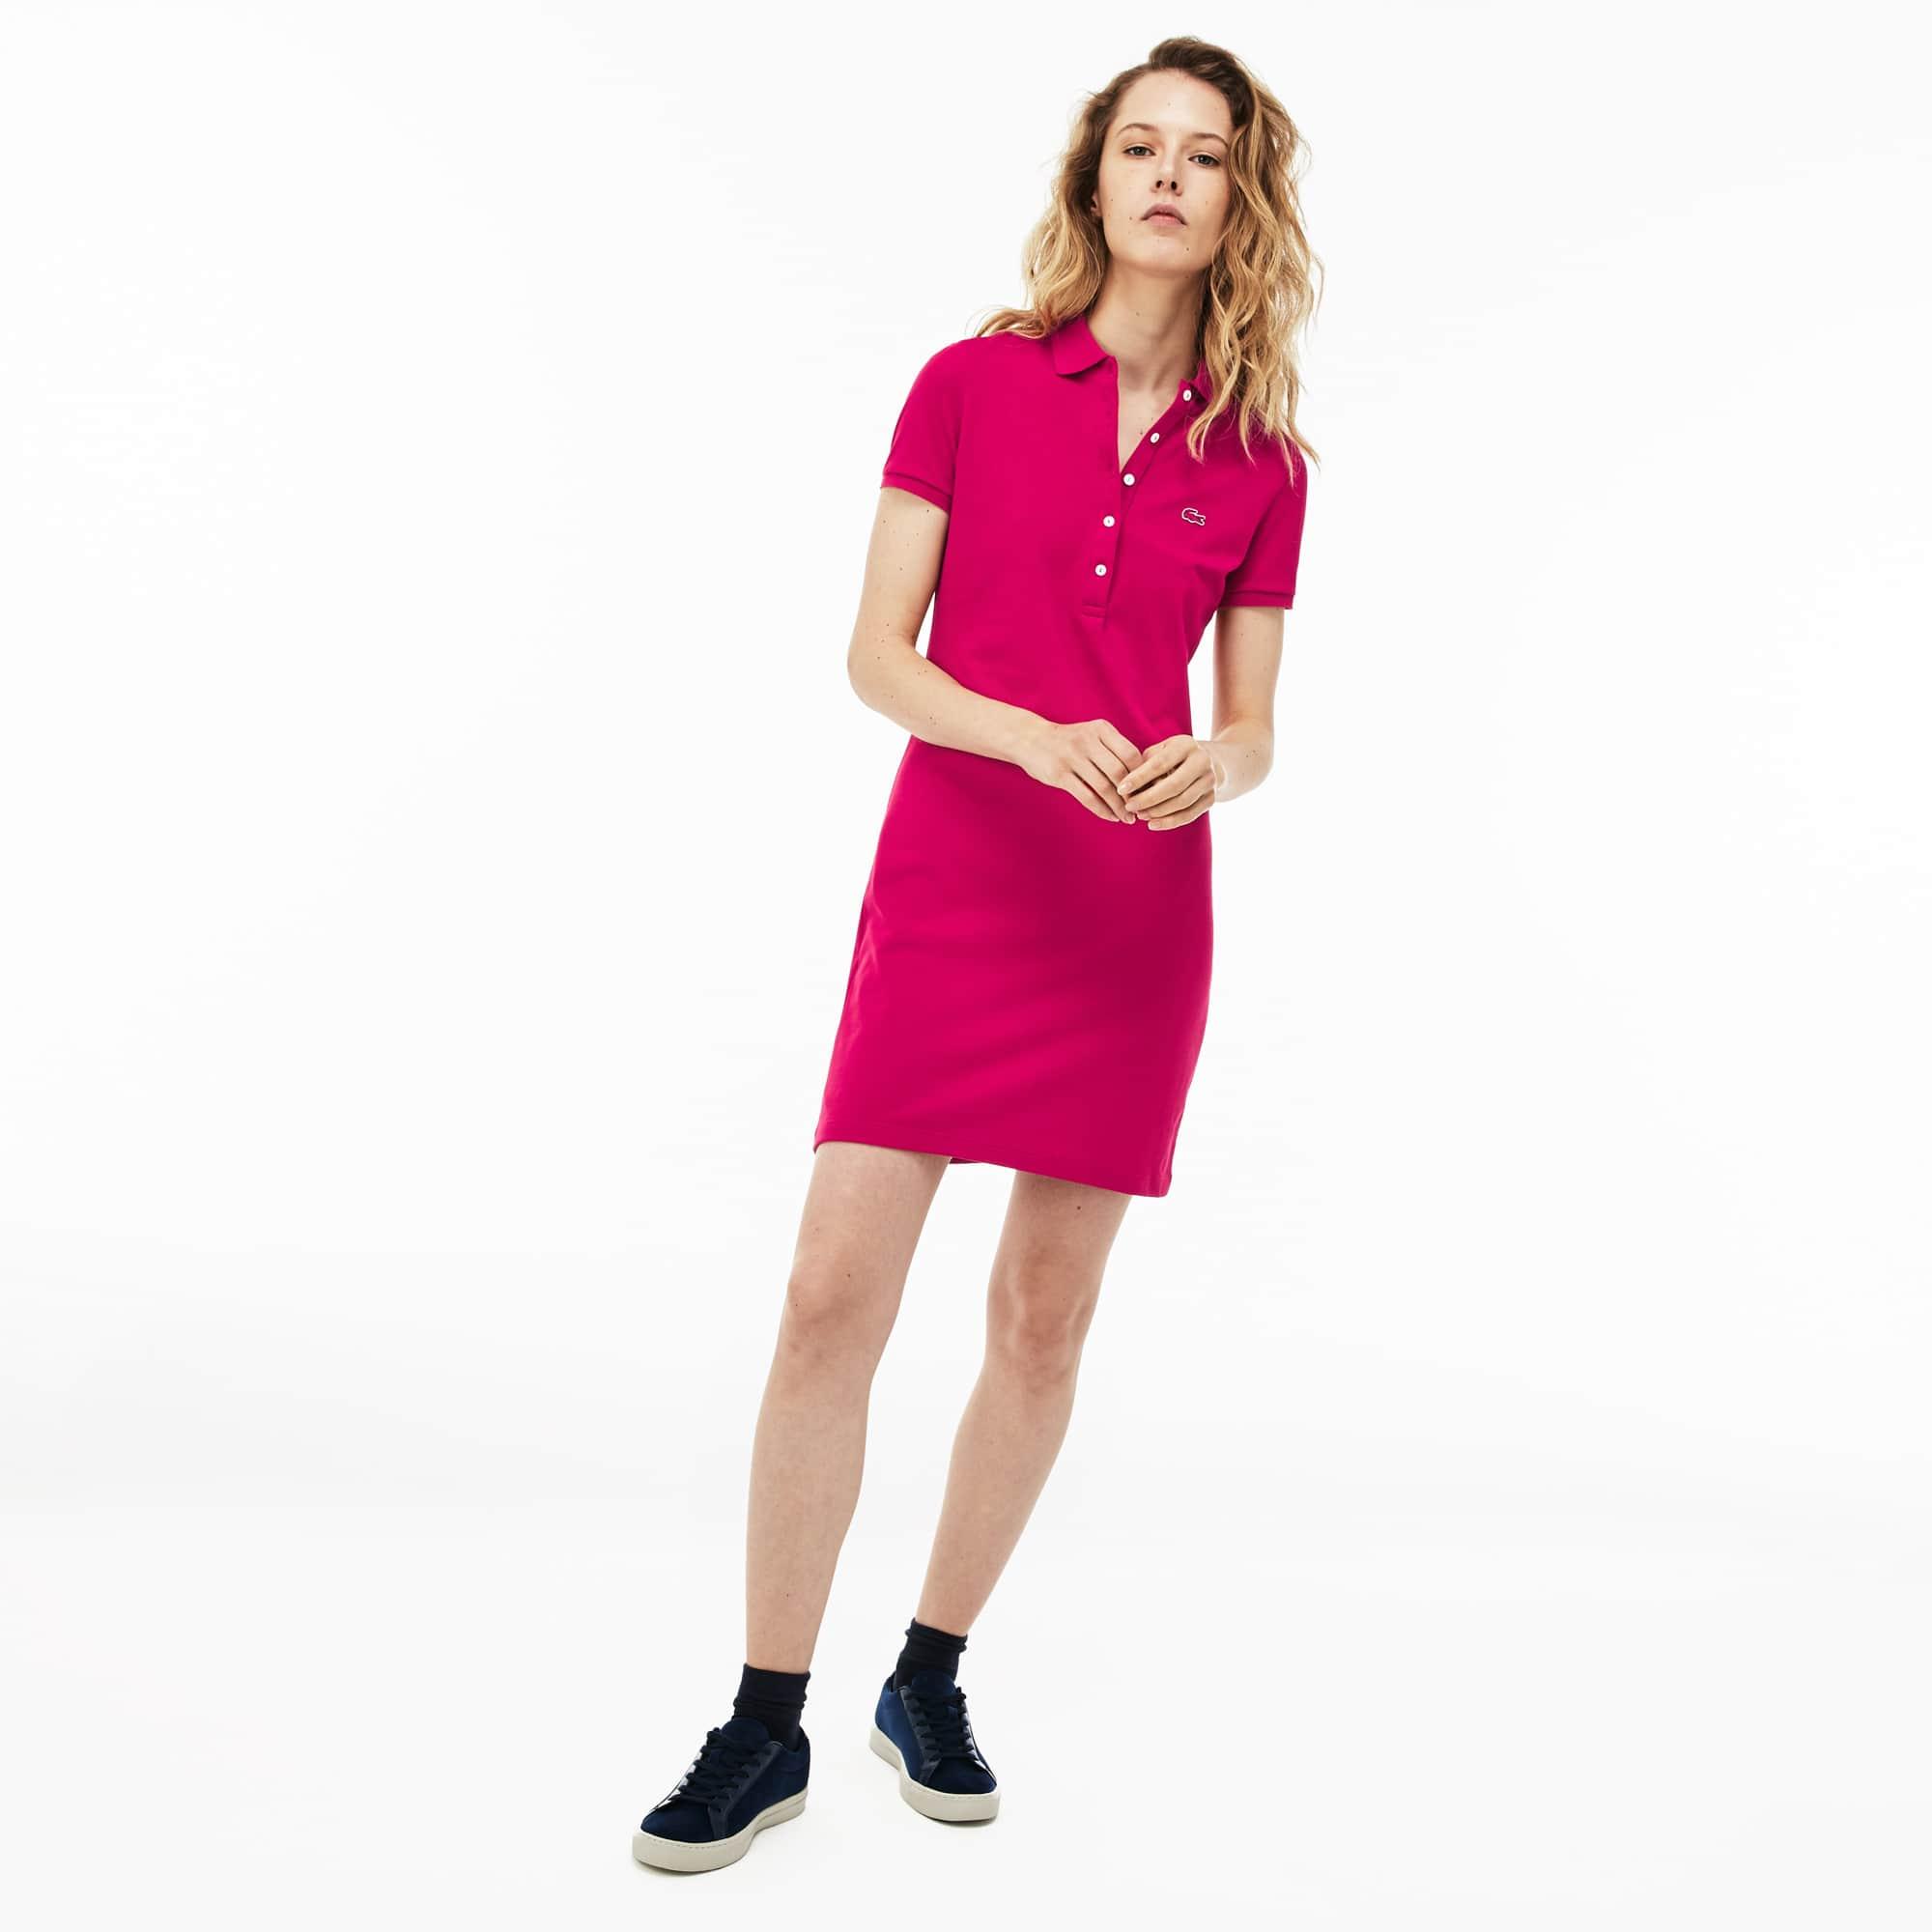 Robes   Jupes   Vêtements Femme   LACOSTE 797db86aafd9